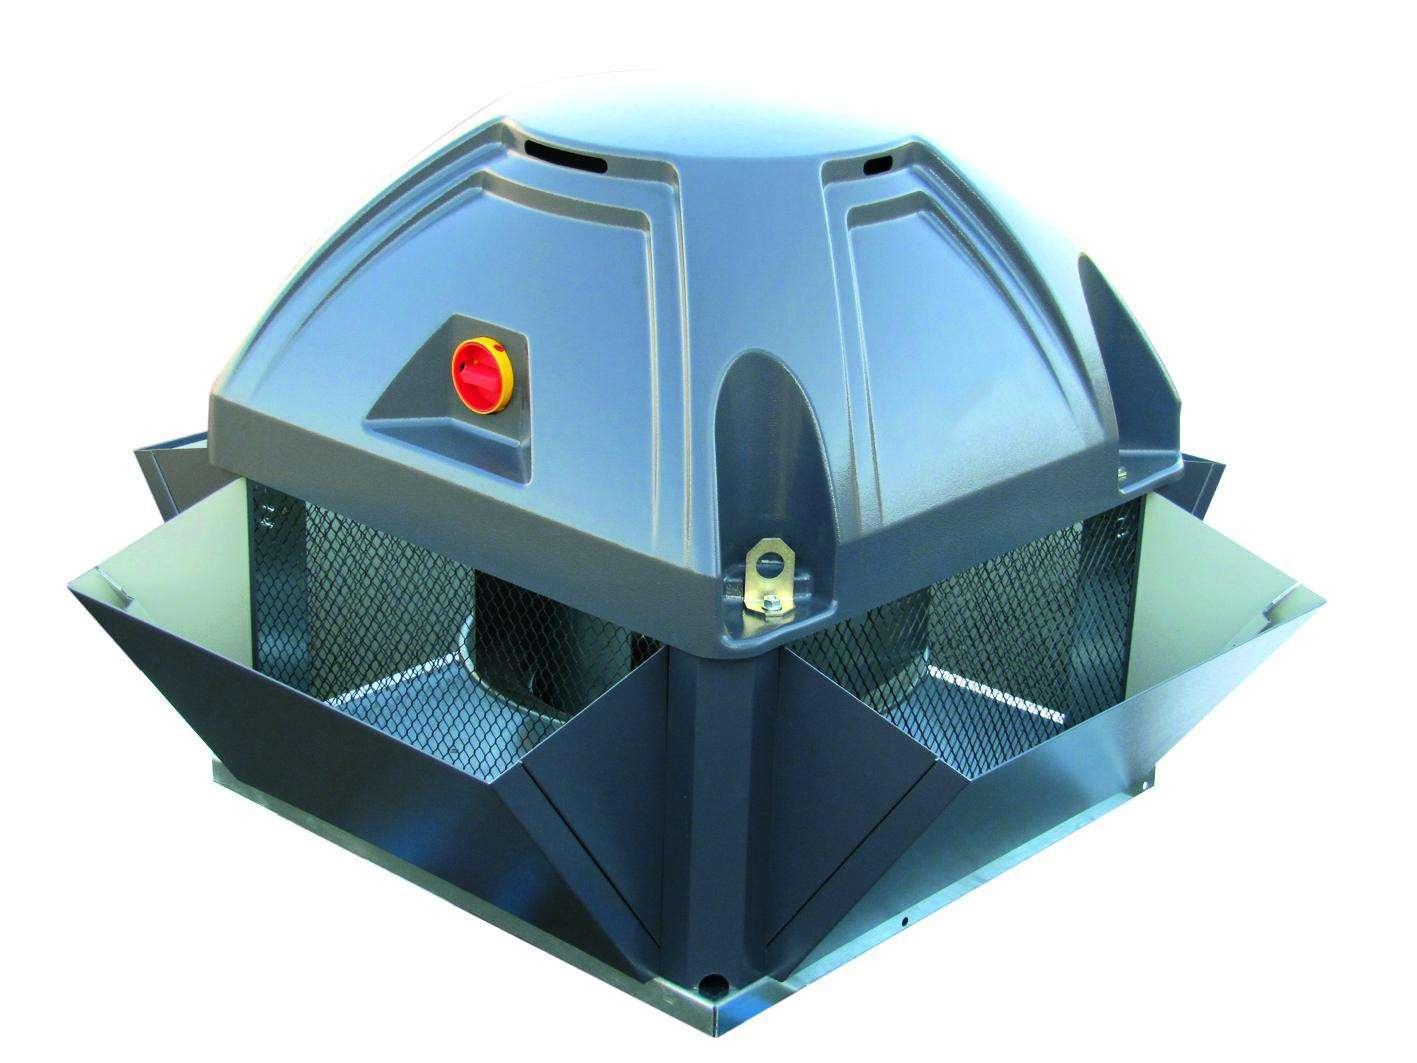 TNVB/6-450 I/IE1 Unelvent S&P Tourelle Centrifuge Rejet Vertical 201345